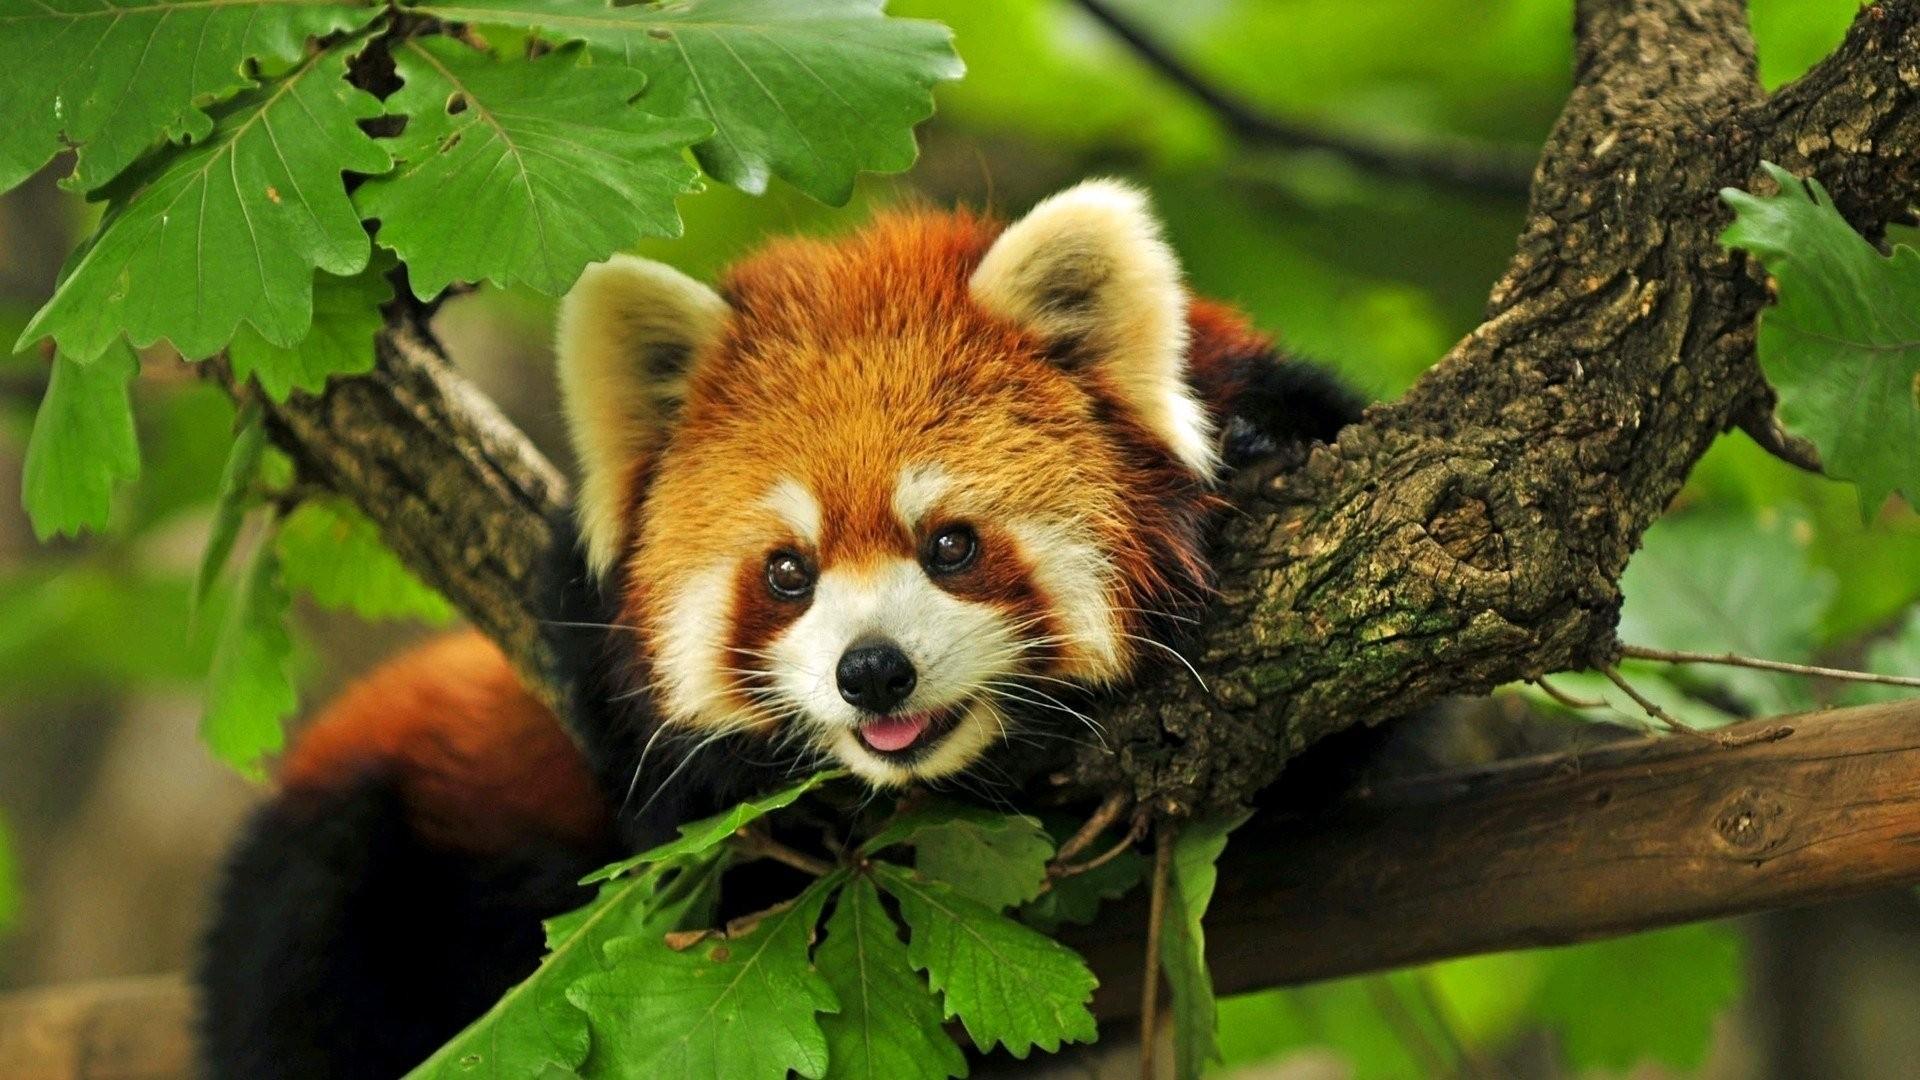 Cute Animal Image